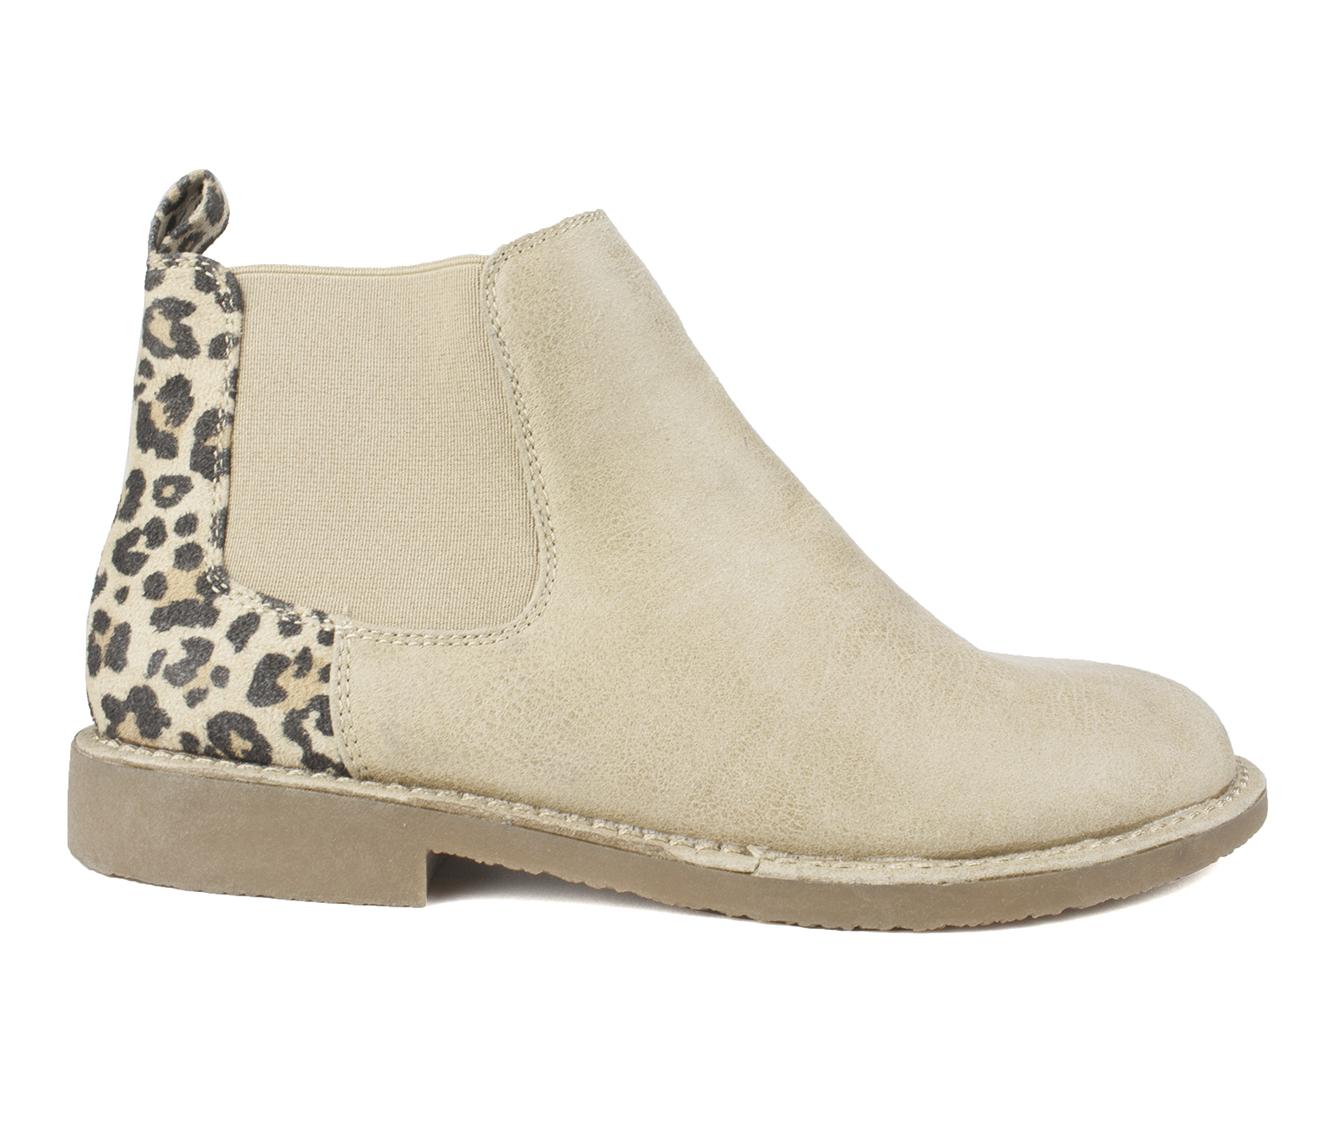 Seven Dials Marisah Women's Boots (Brown - Canvas)